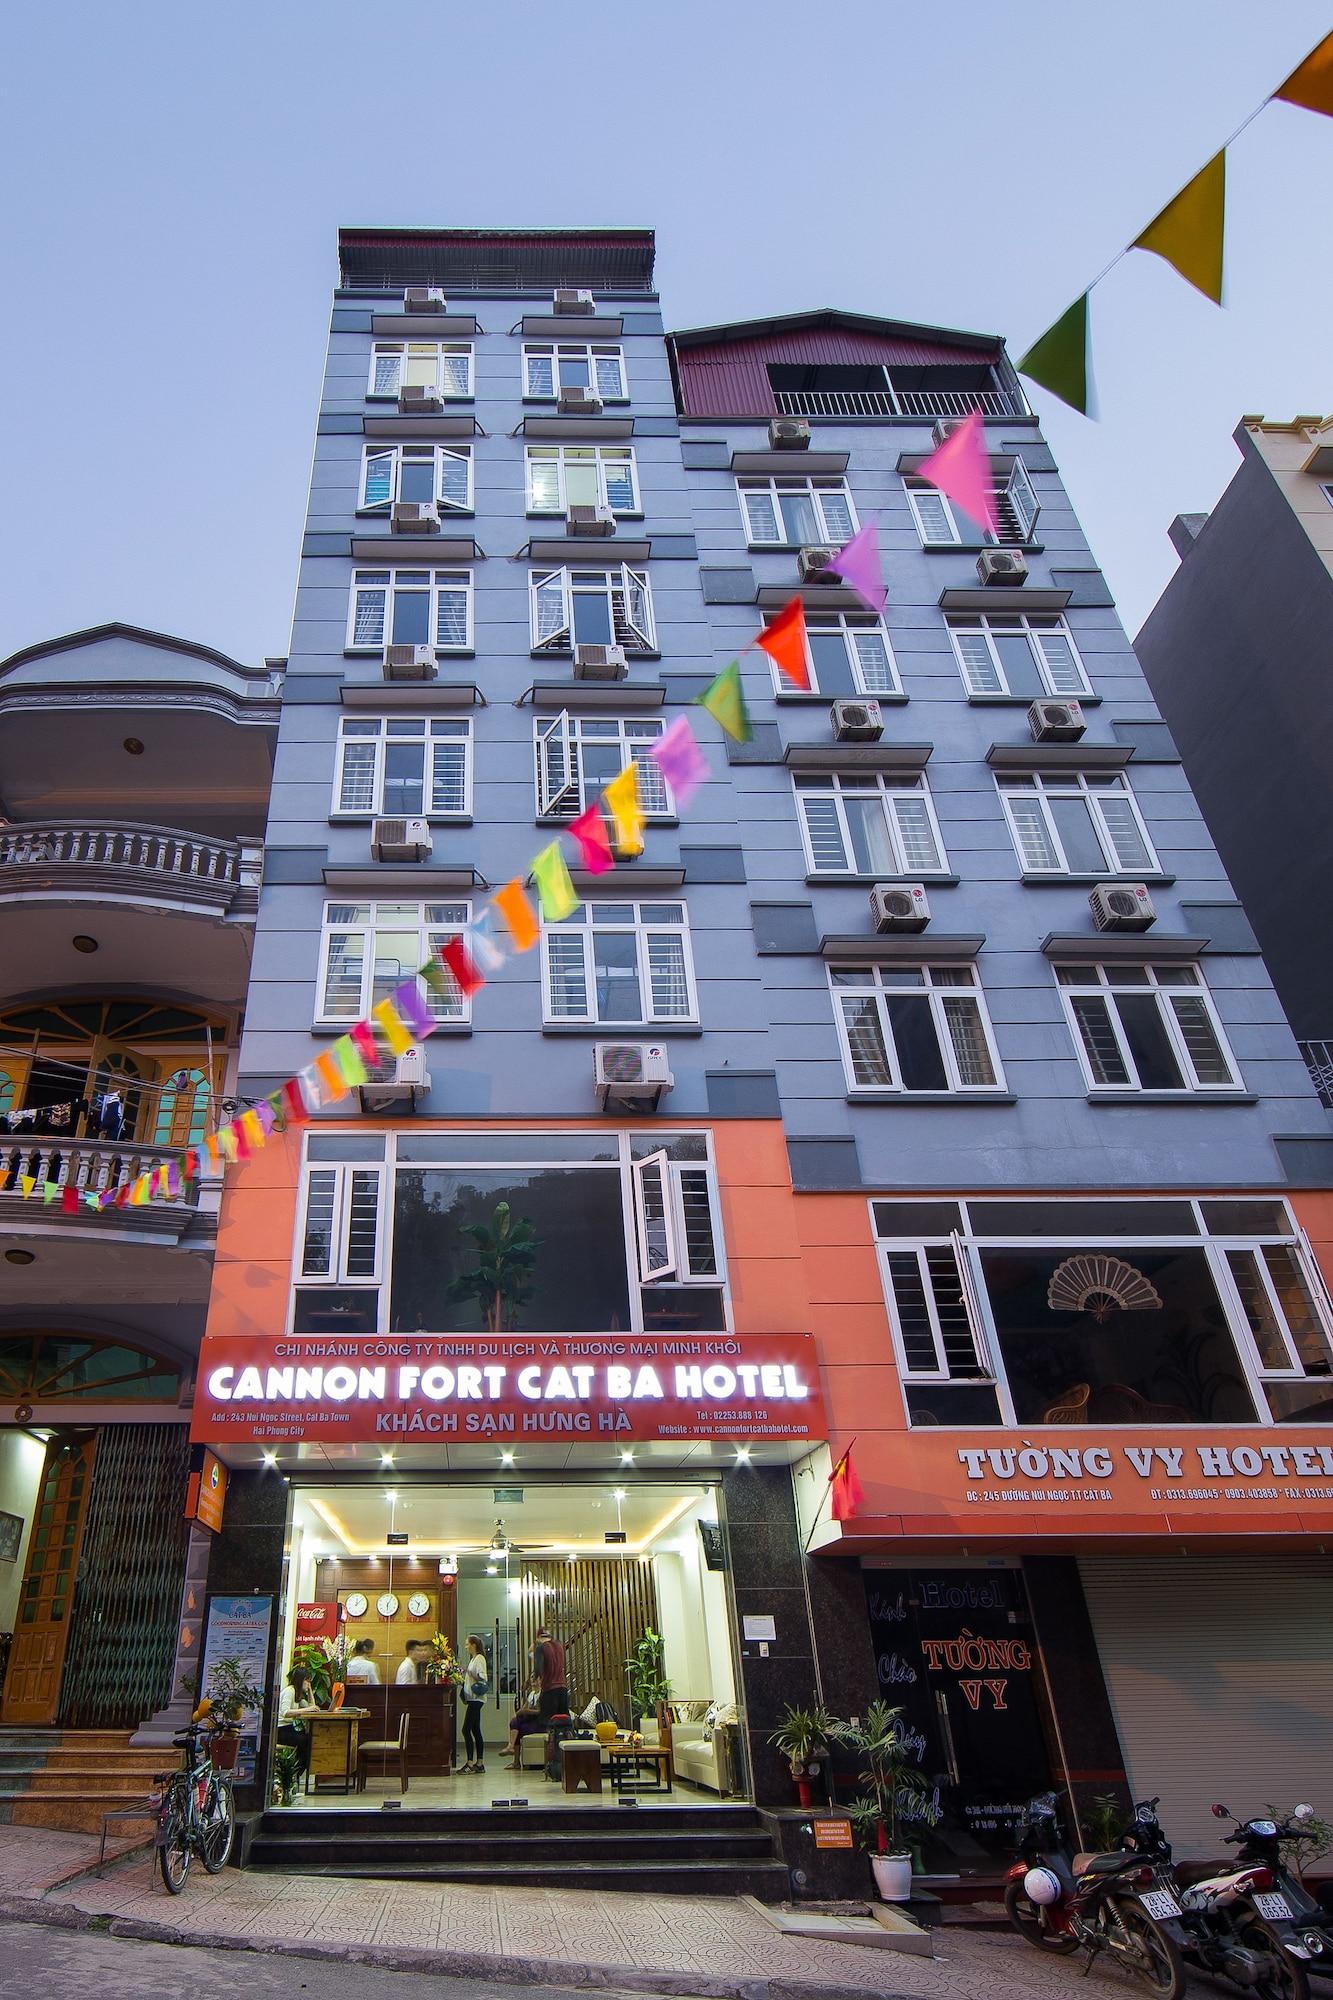 Cannon Fort Cat Ba Hotel, Cát Hải